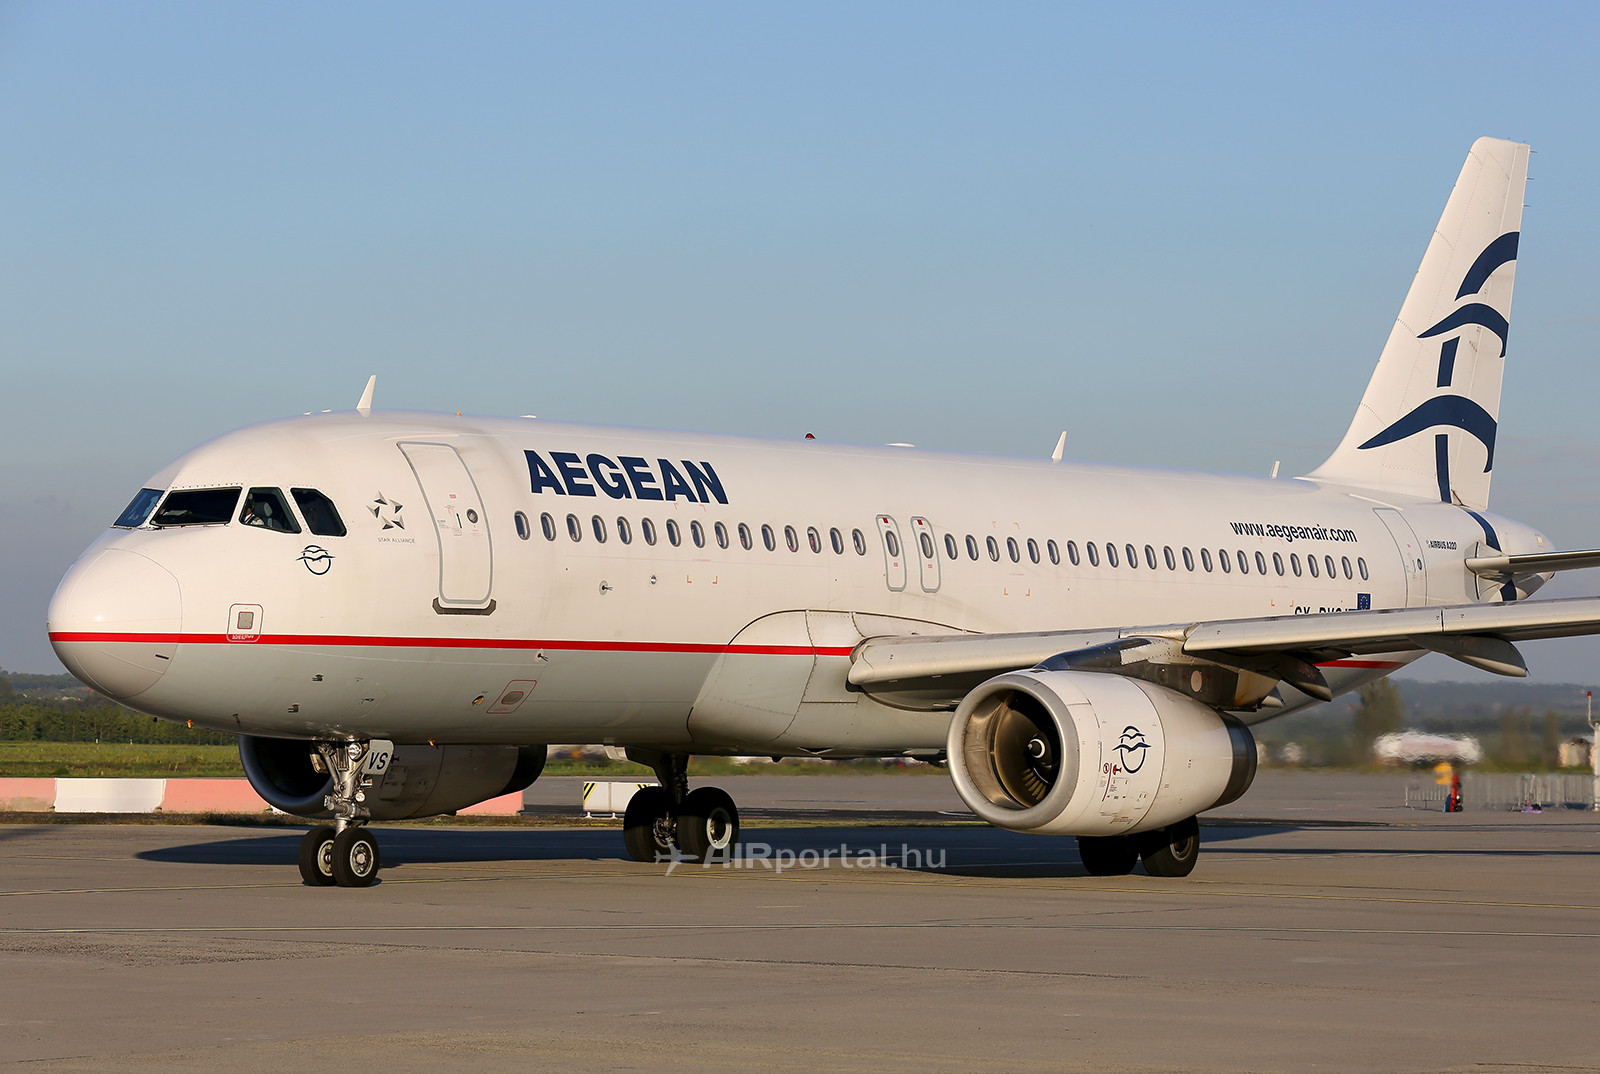 Az Aegean Airlines egyik Airbus A320-as repülőgépe Budapesten. (Fotó: AIRportal.hu) | © AIRportal.hu